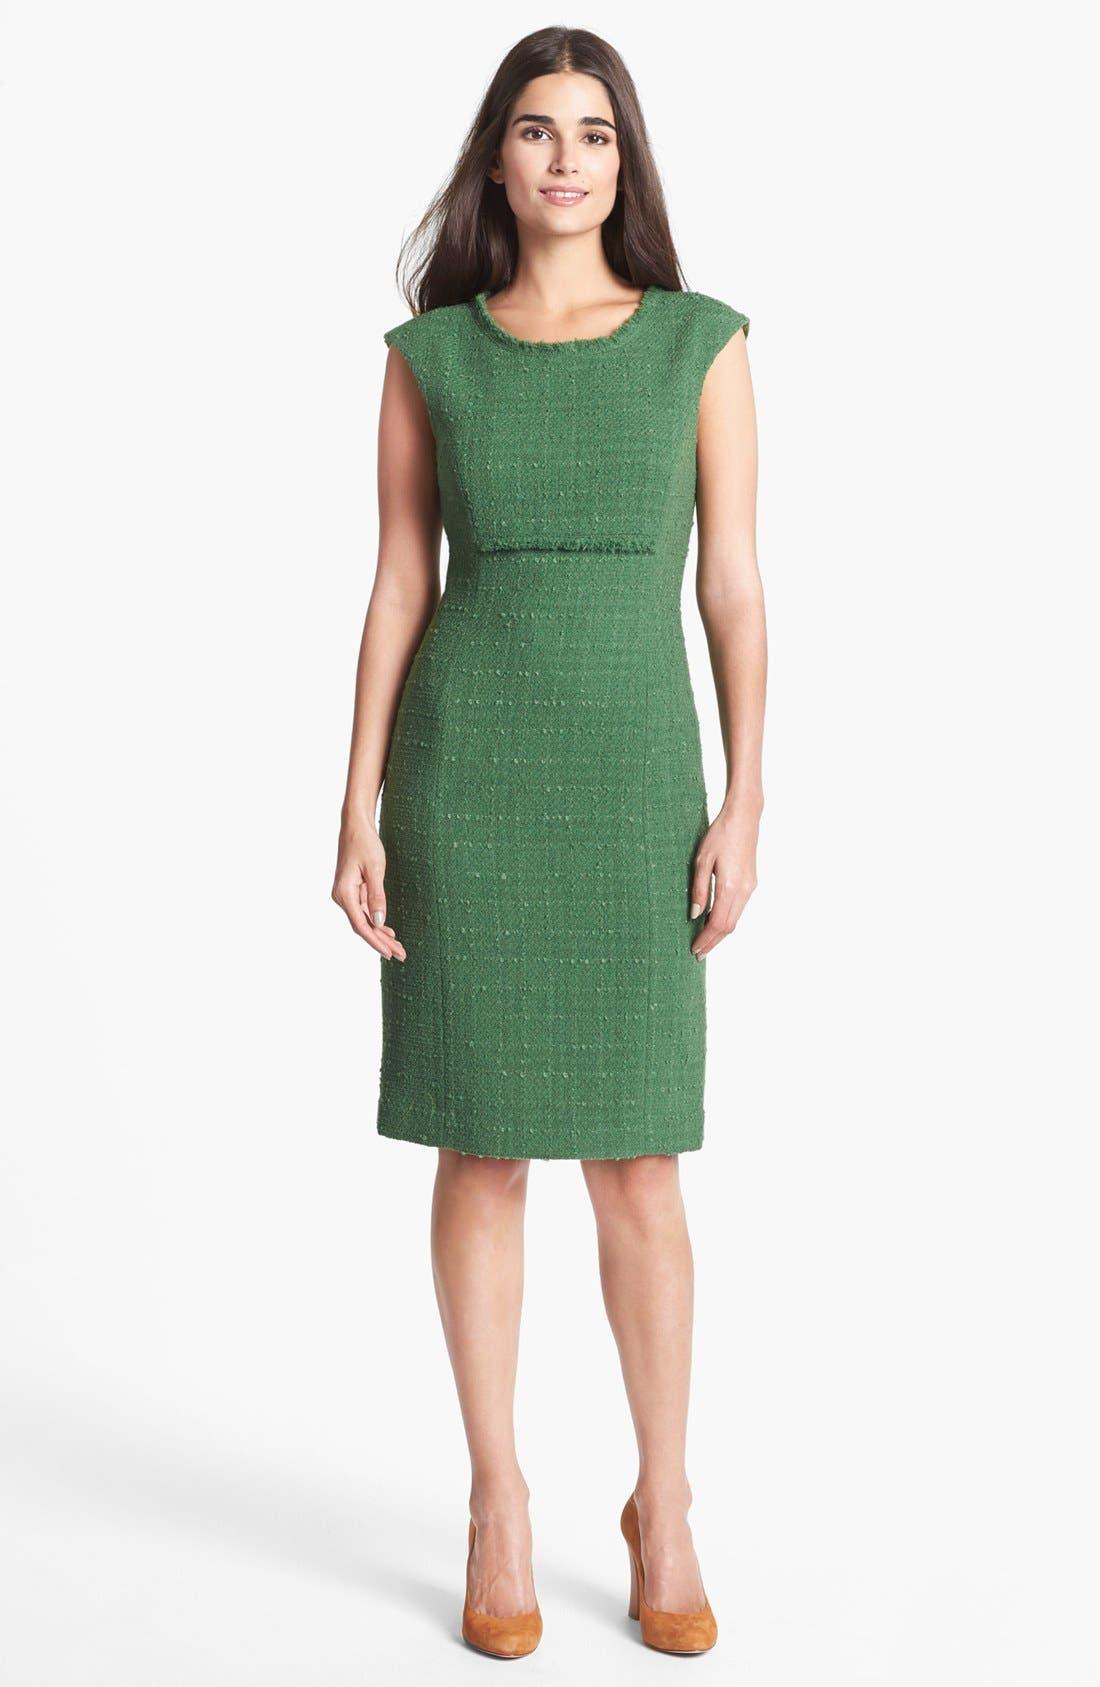 Alternate Image 1 Selected - Santorelli Tweed Sheath Dress